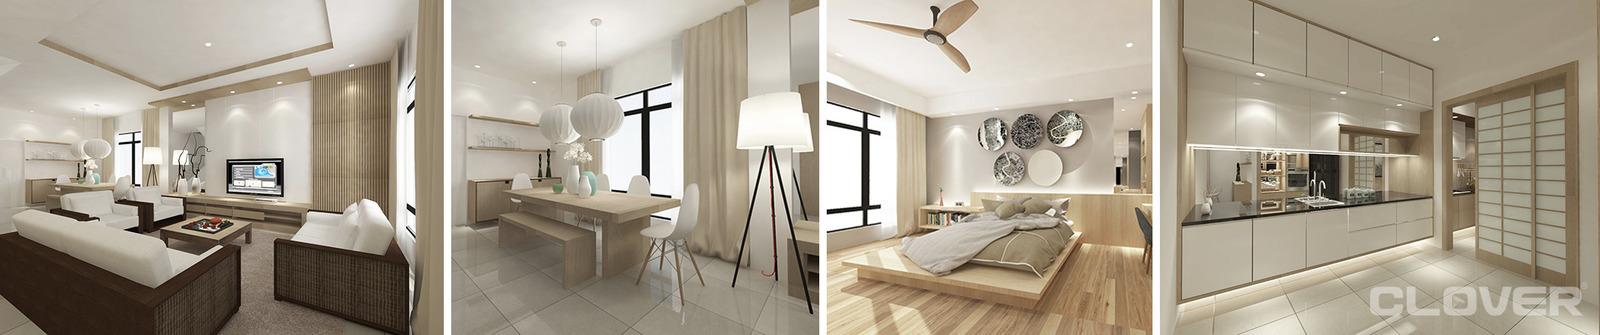 Clover Buildcon Sdn Bhd